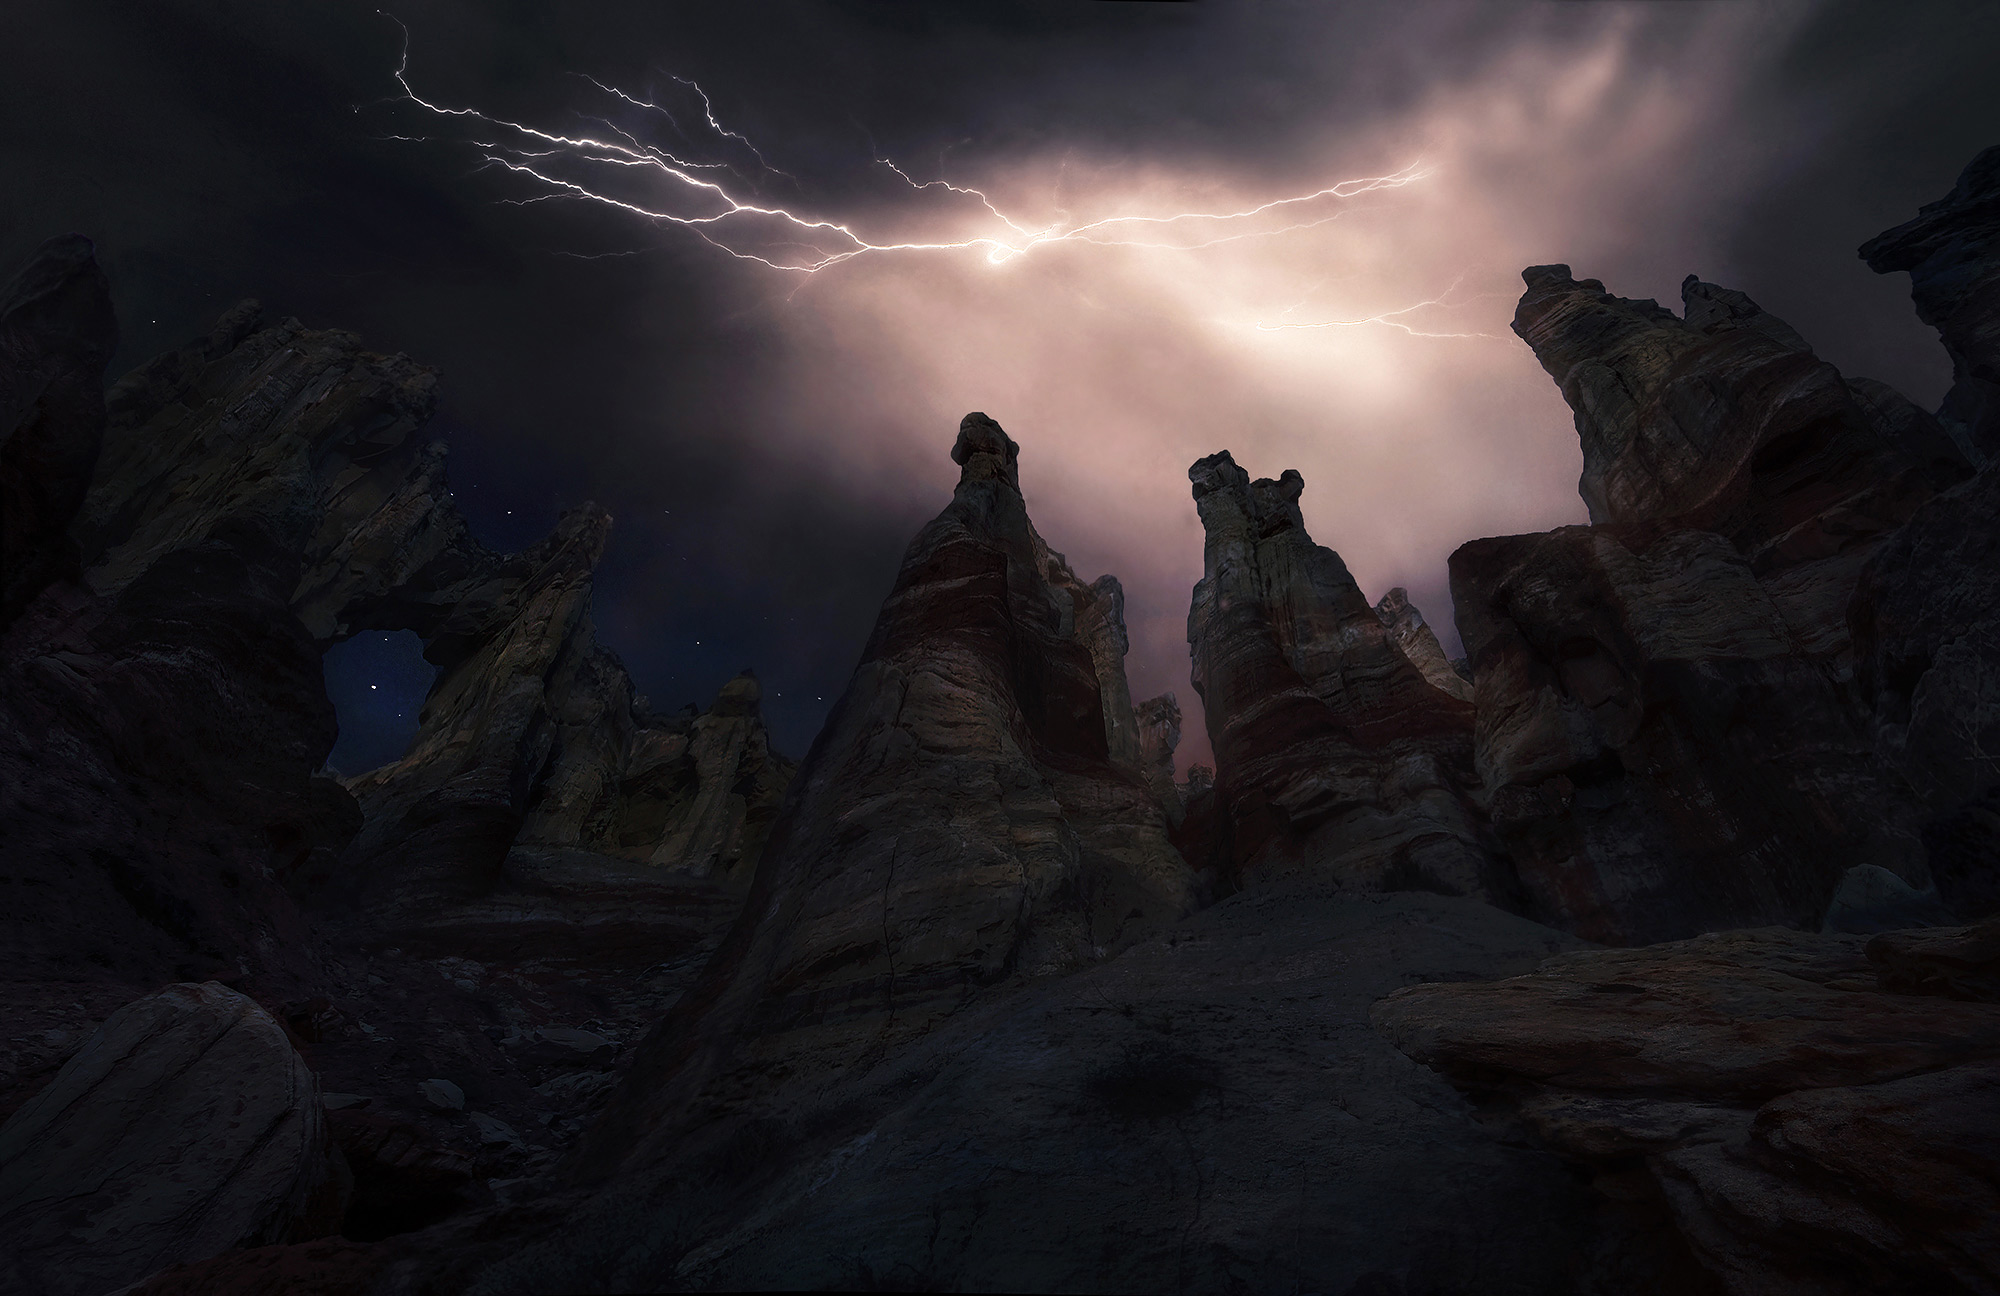 Arizona, Lightning, Storm, Unique, arch, photo